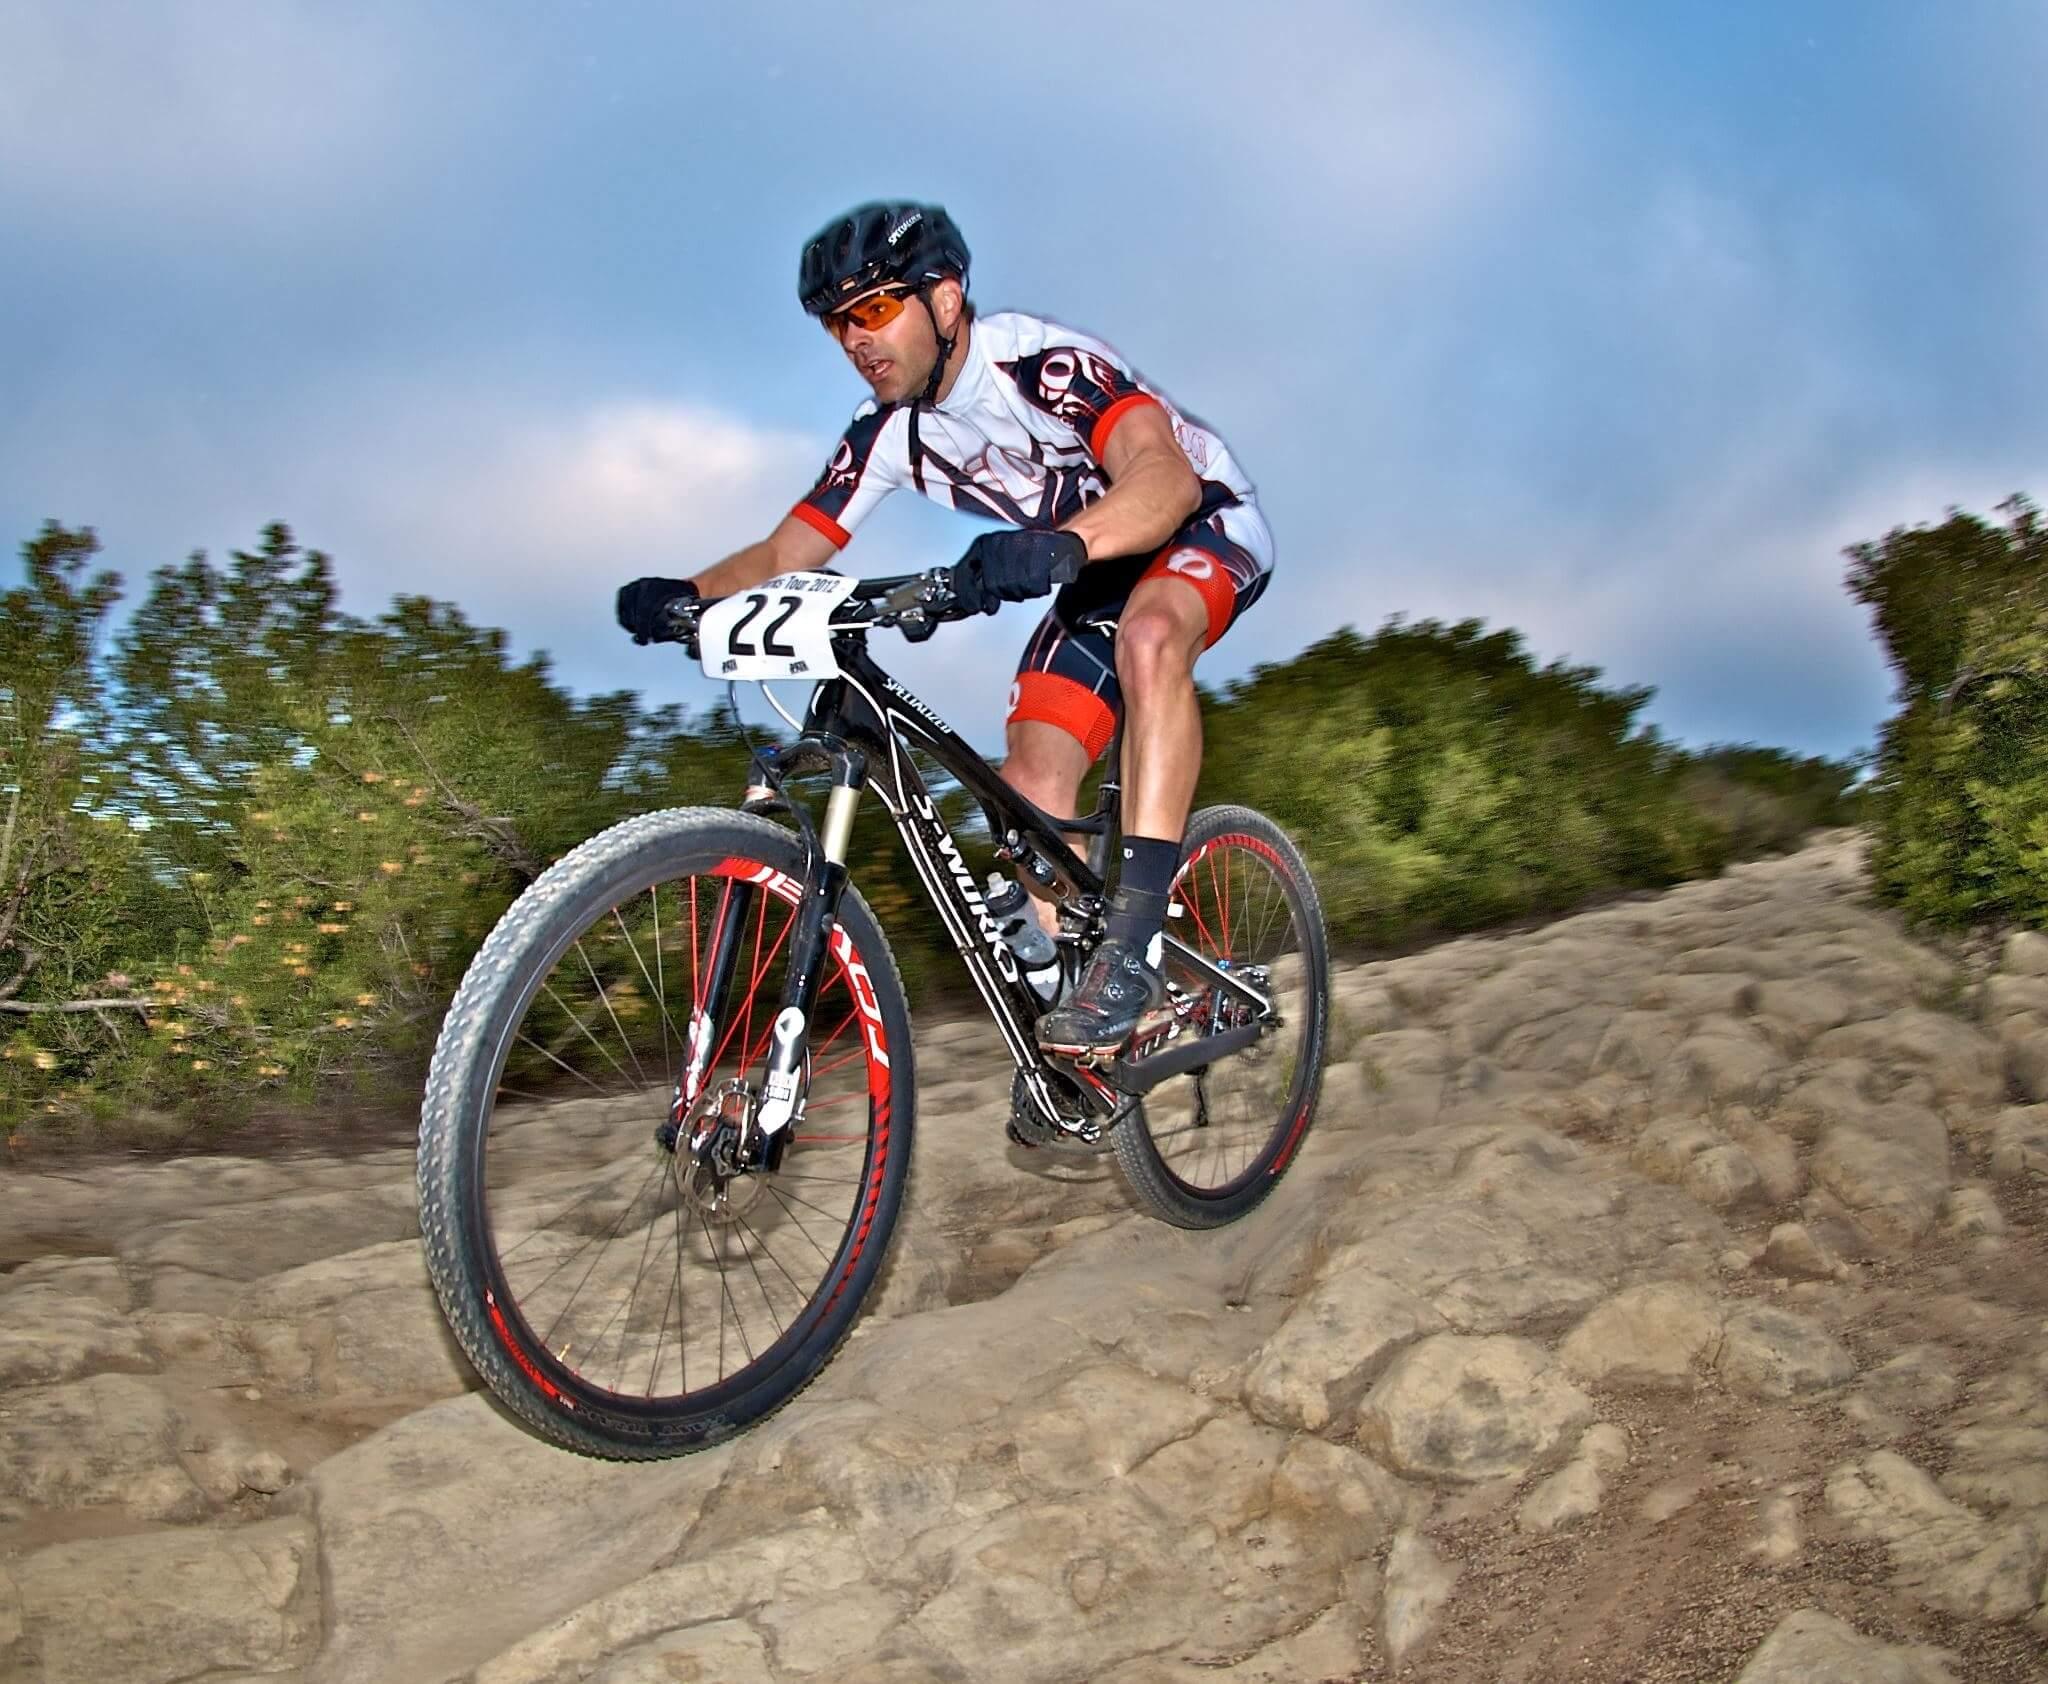 Image of Josh Matthew riding his mountain bike